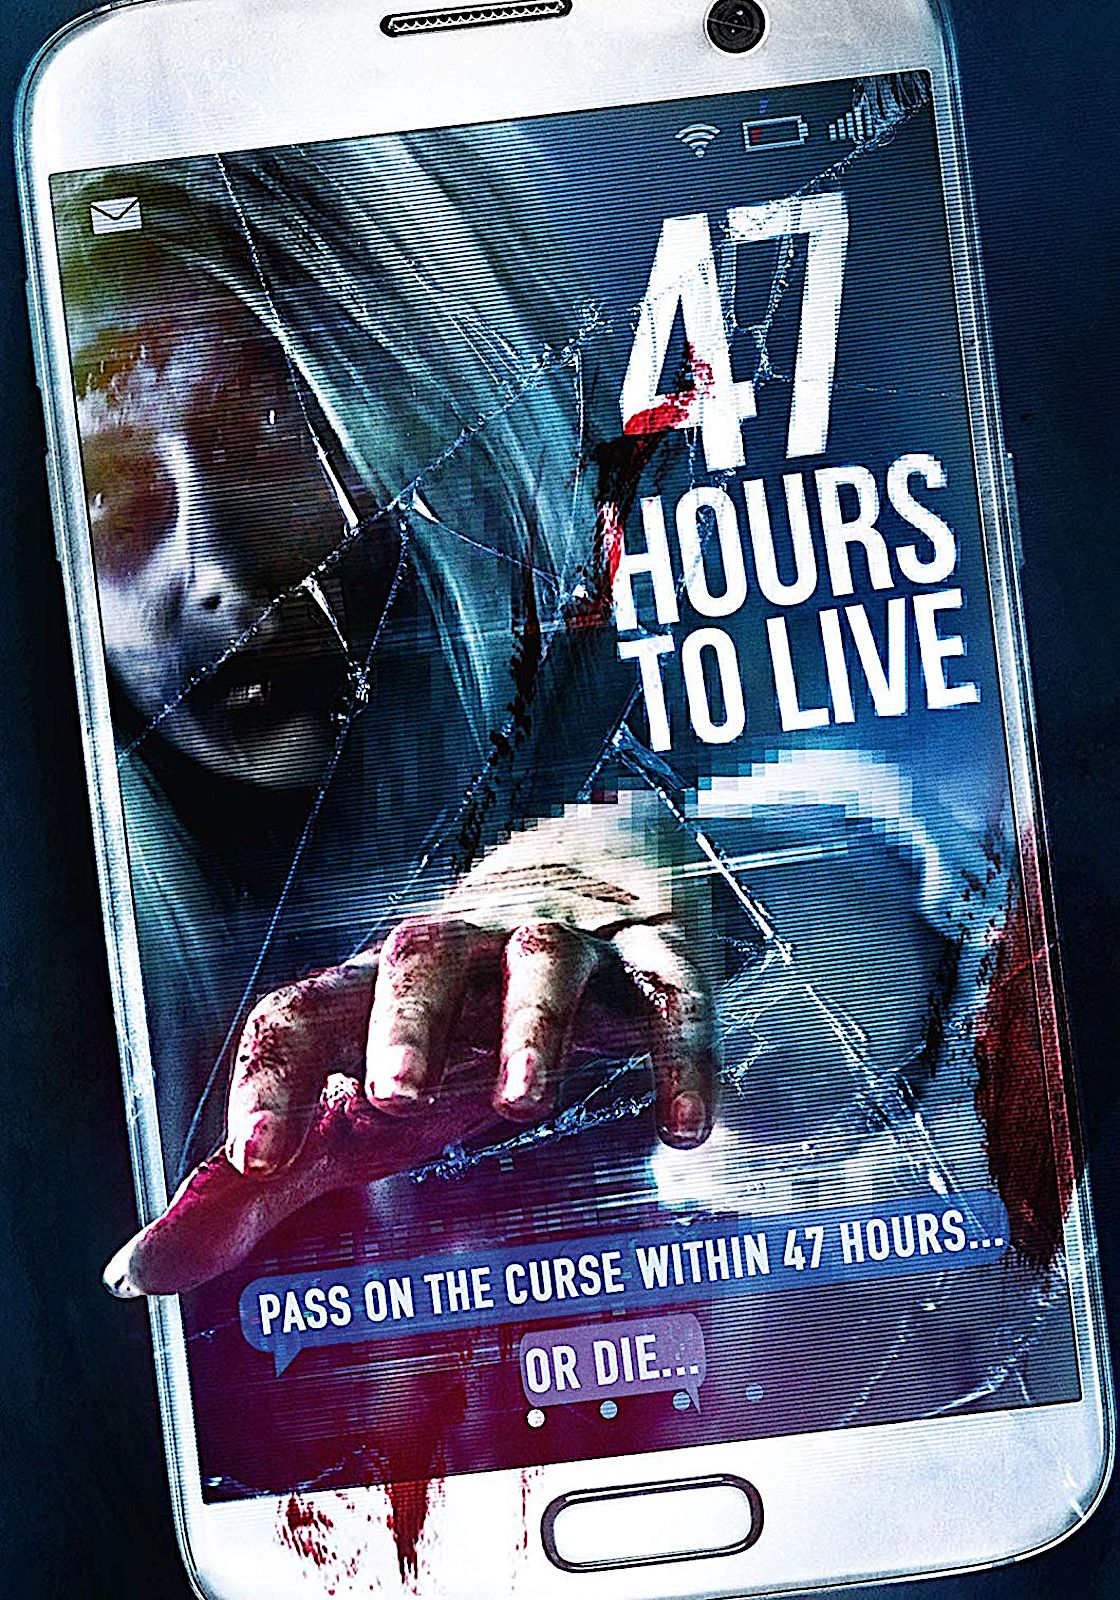 47 Hours To Live Dvd 4digital Cover Artwork Horror Movies Cover Art